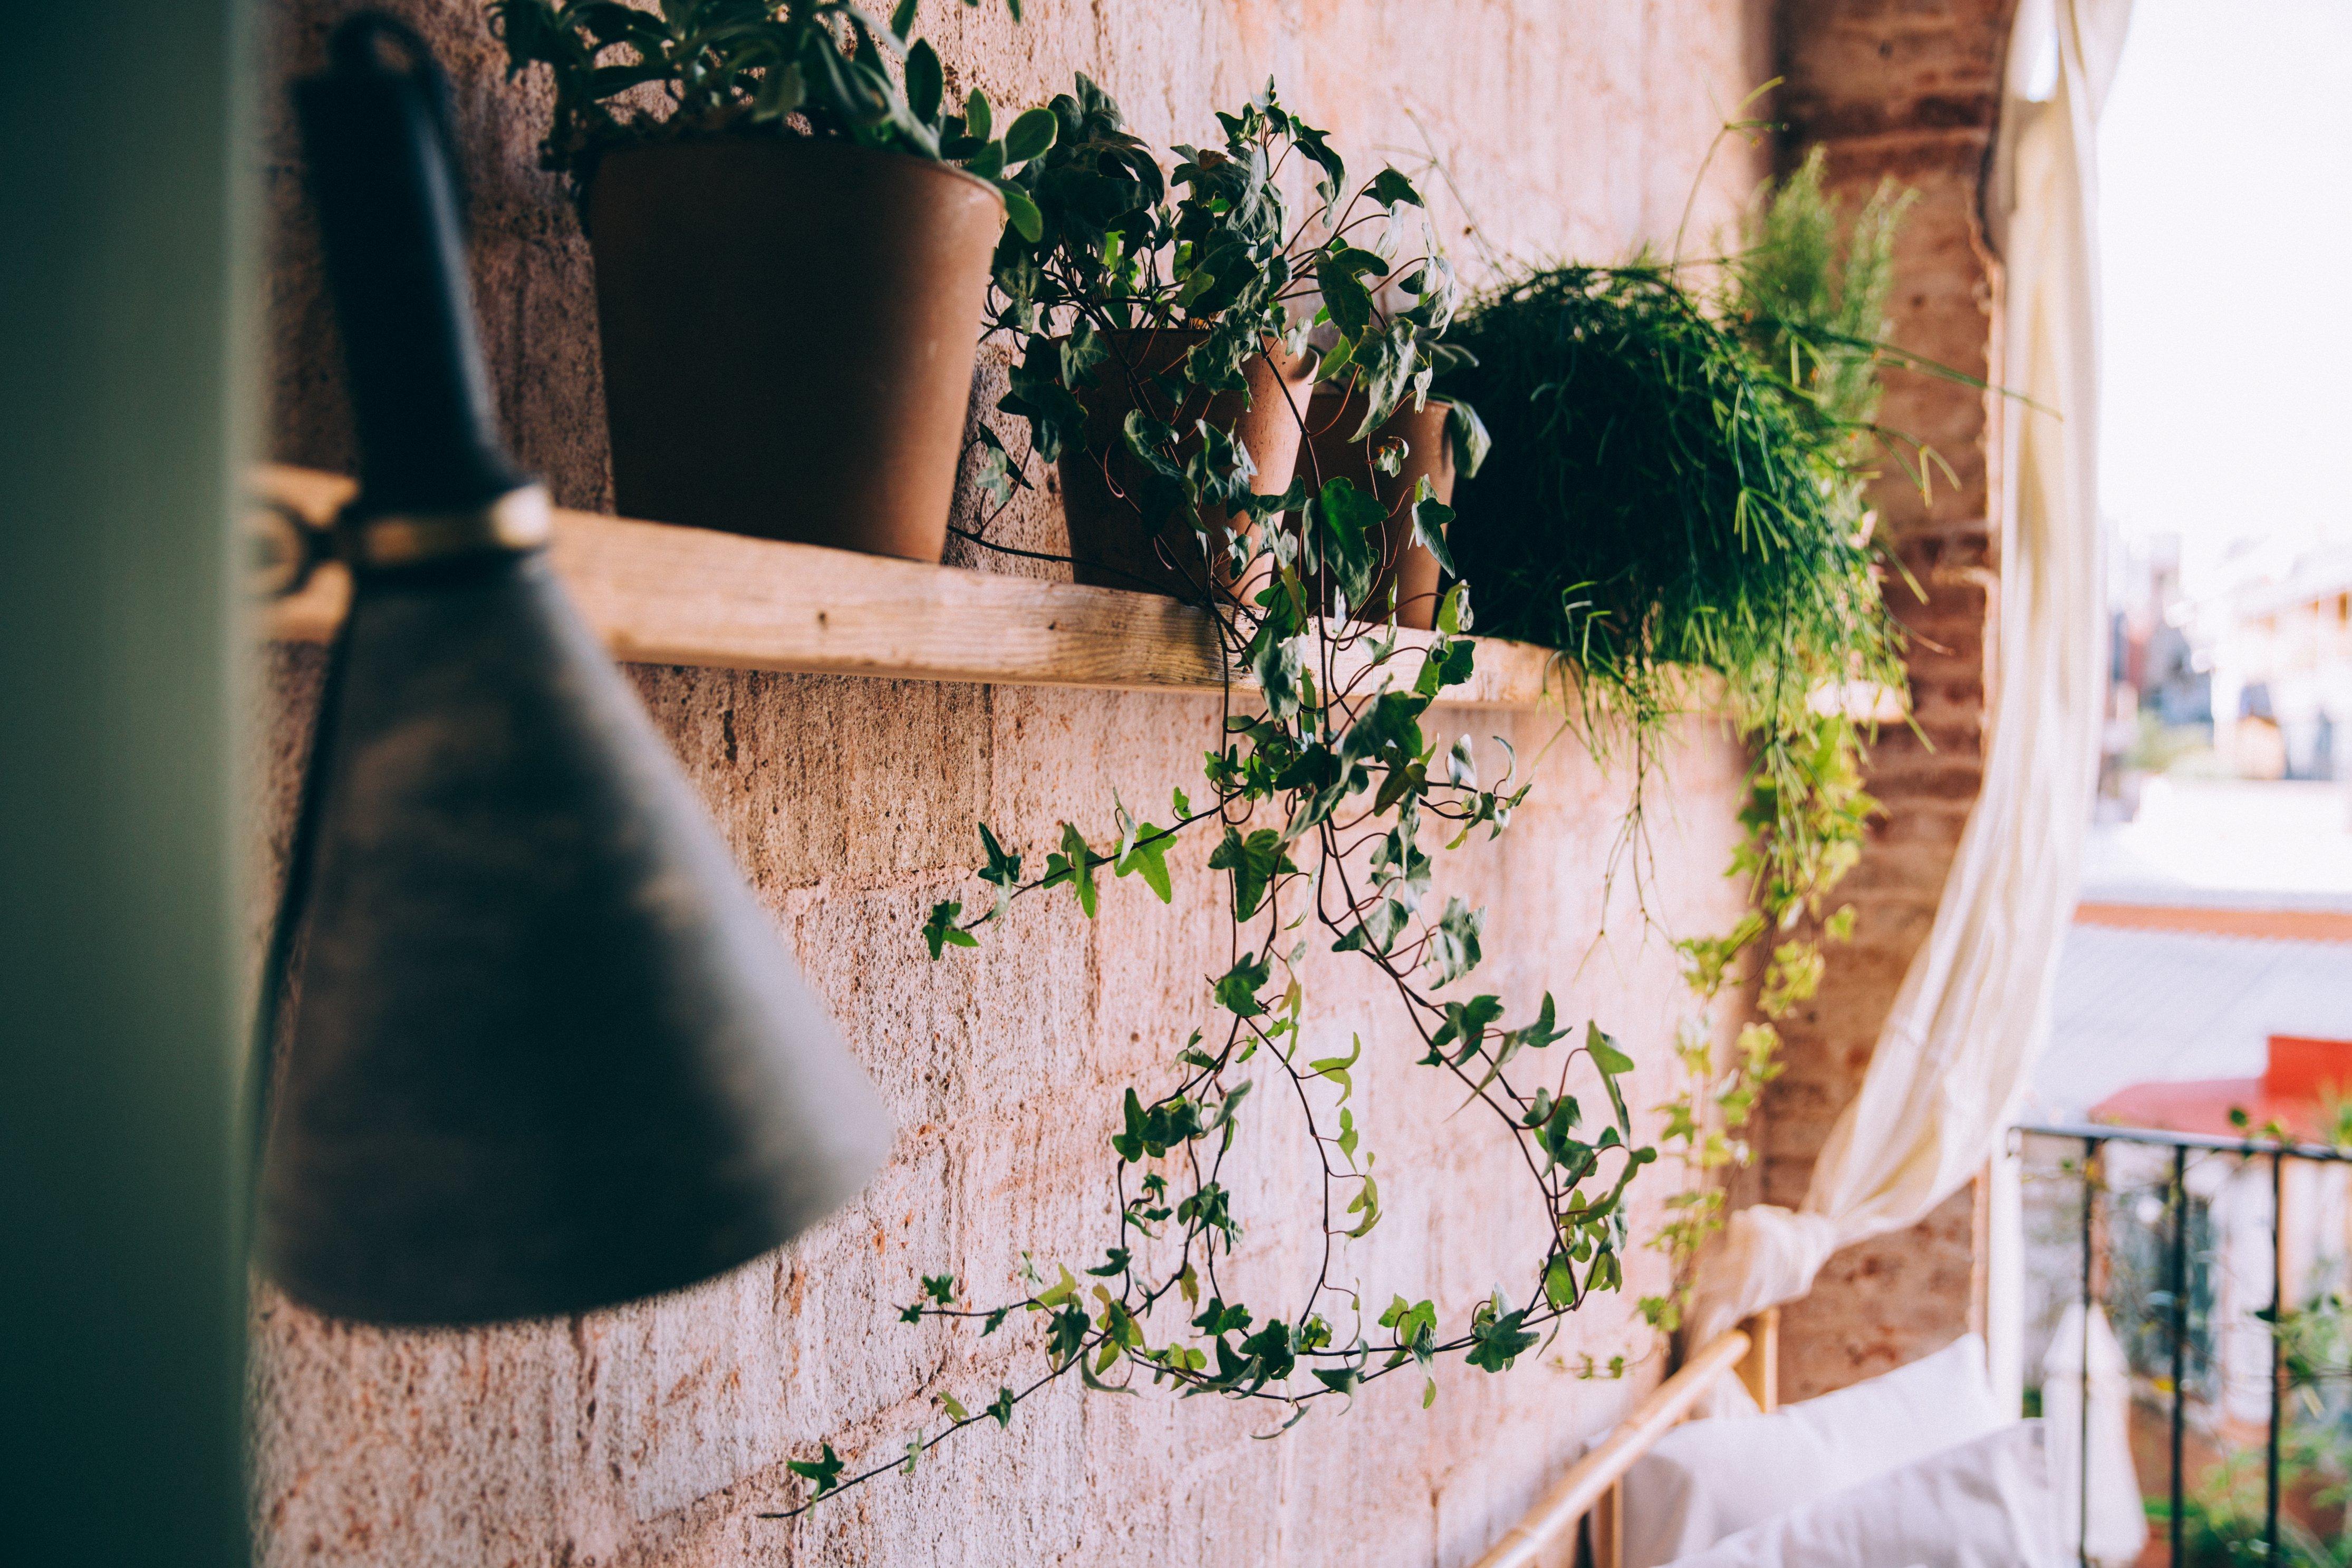 5 Pivotal Ways to Make Gardening Almost Effortless